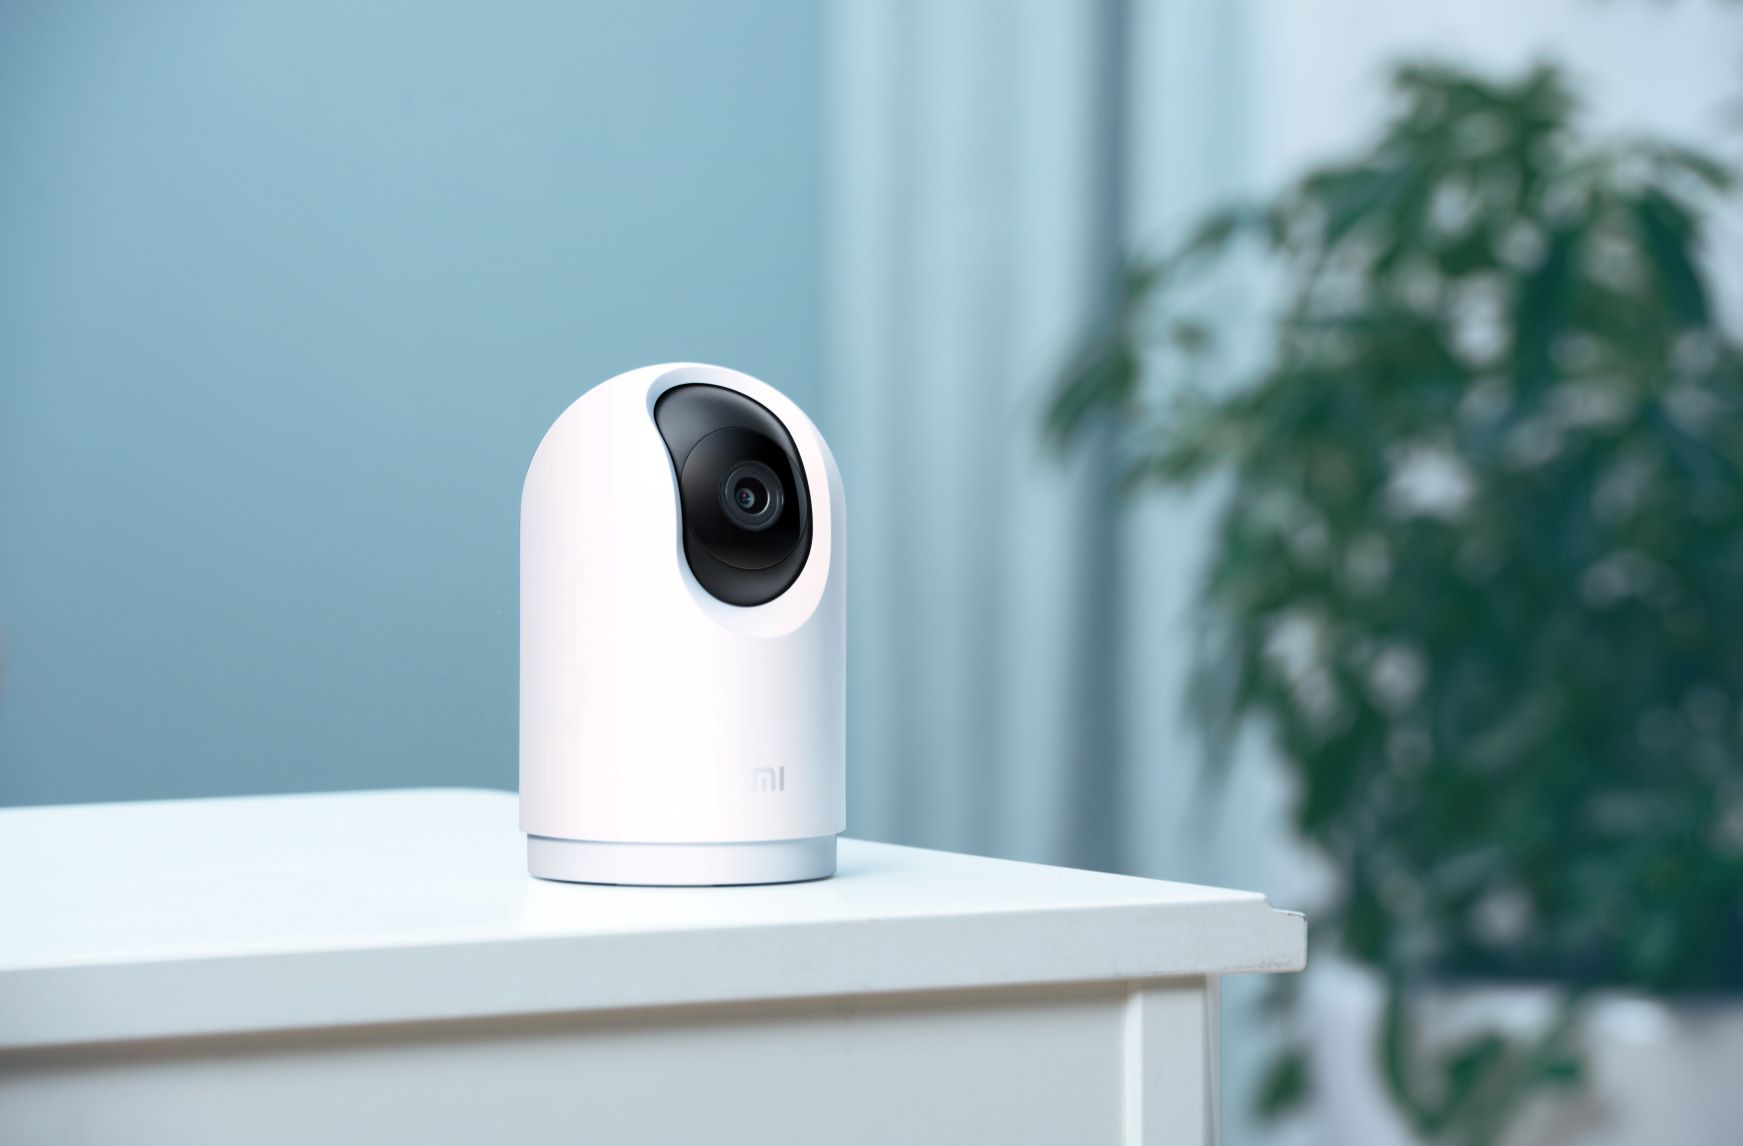 Mi 360° Home Security Camera 2K Pro - Smarte Überwachungskamera